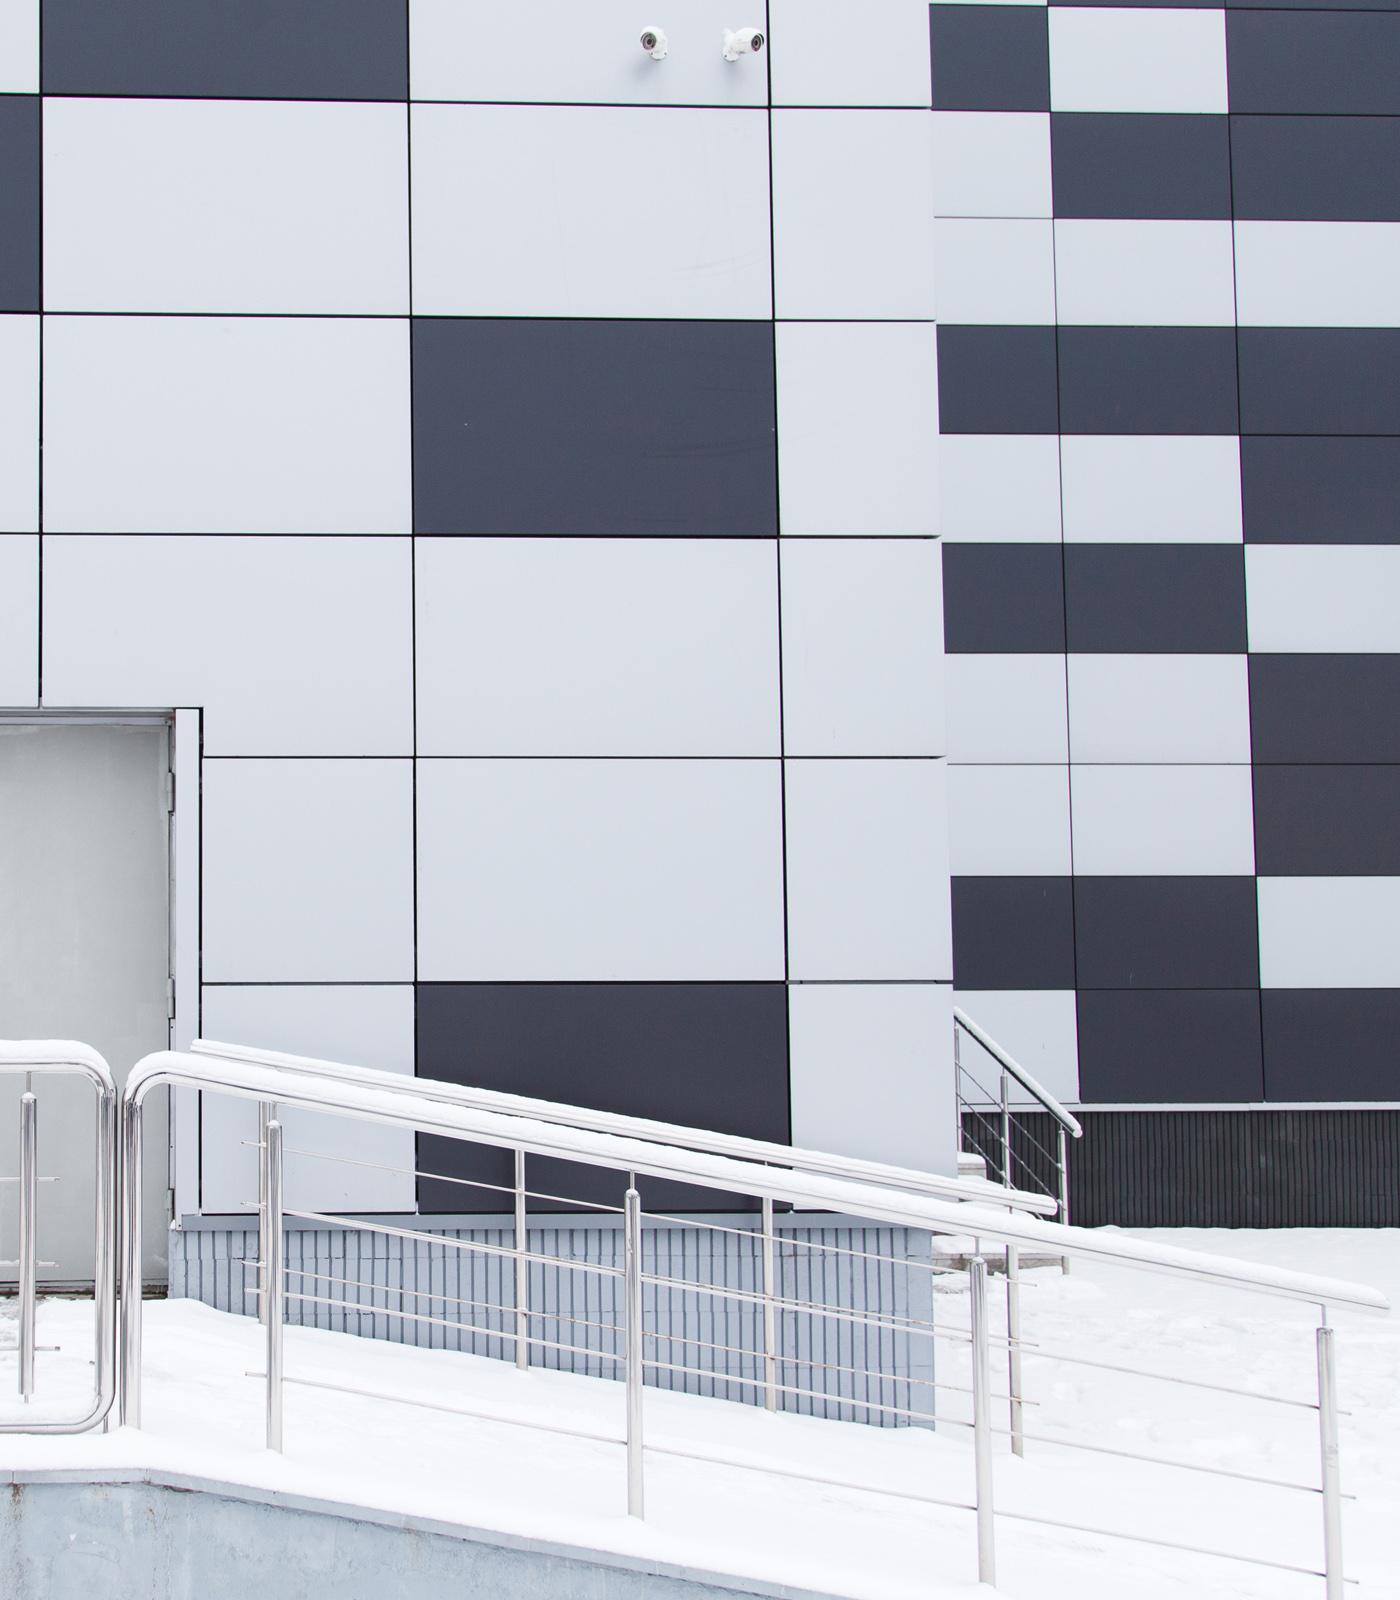 Panel sandwich Composite para fachada, realizado por Rótulos Art Design